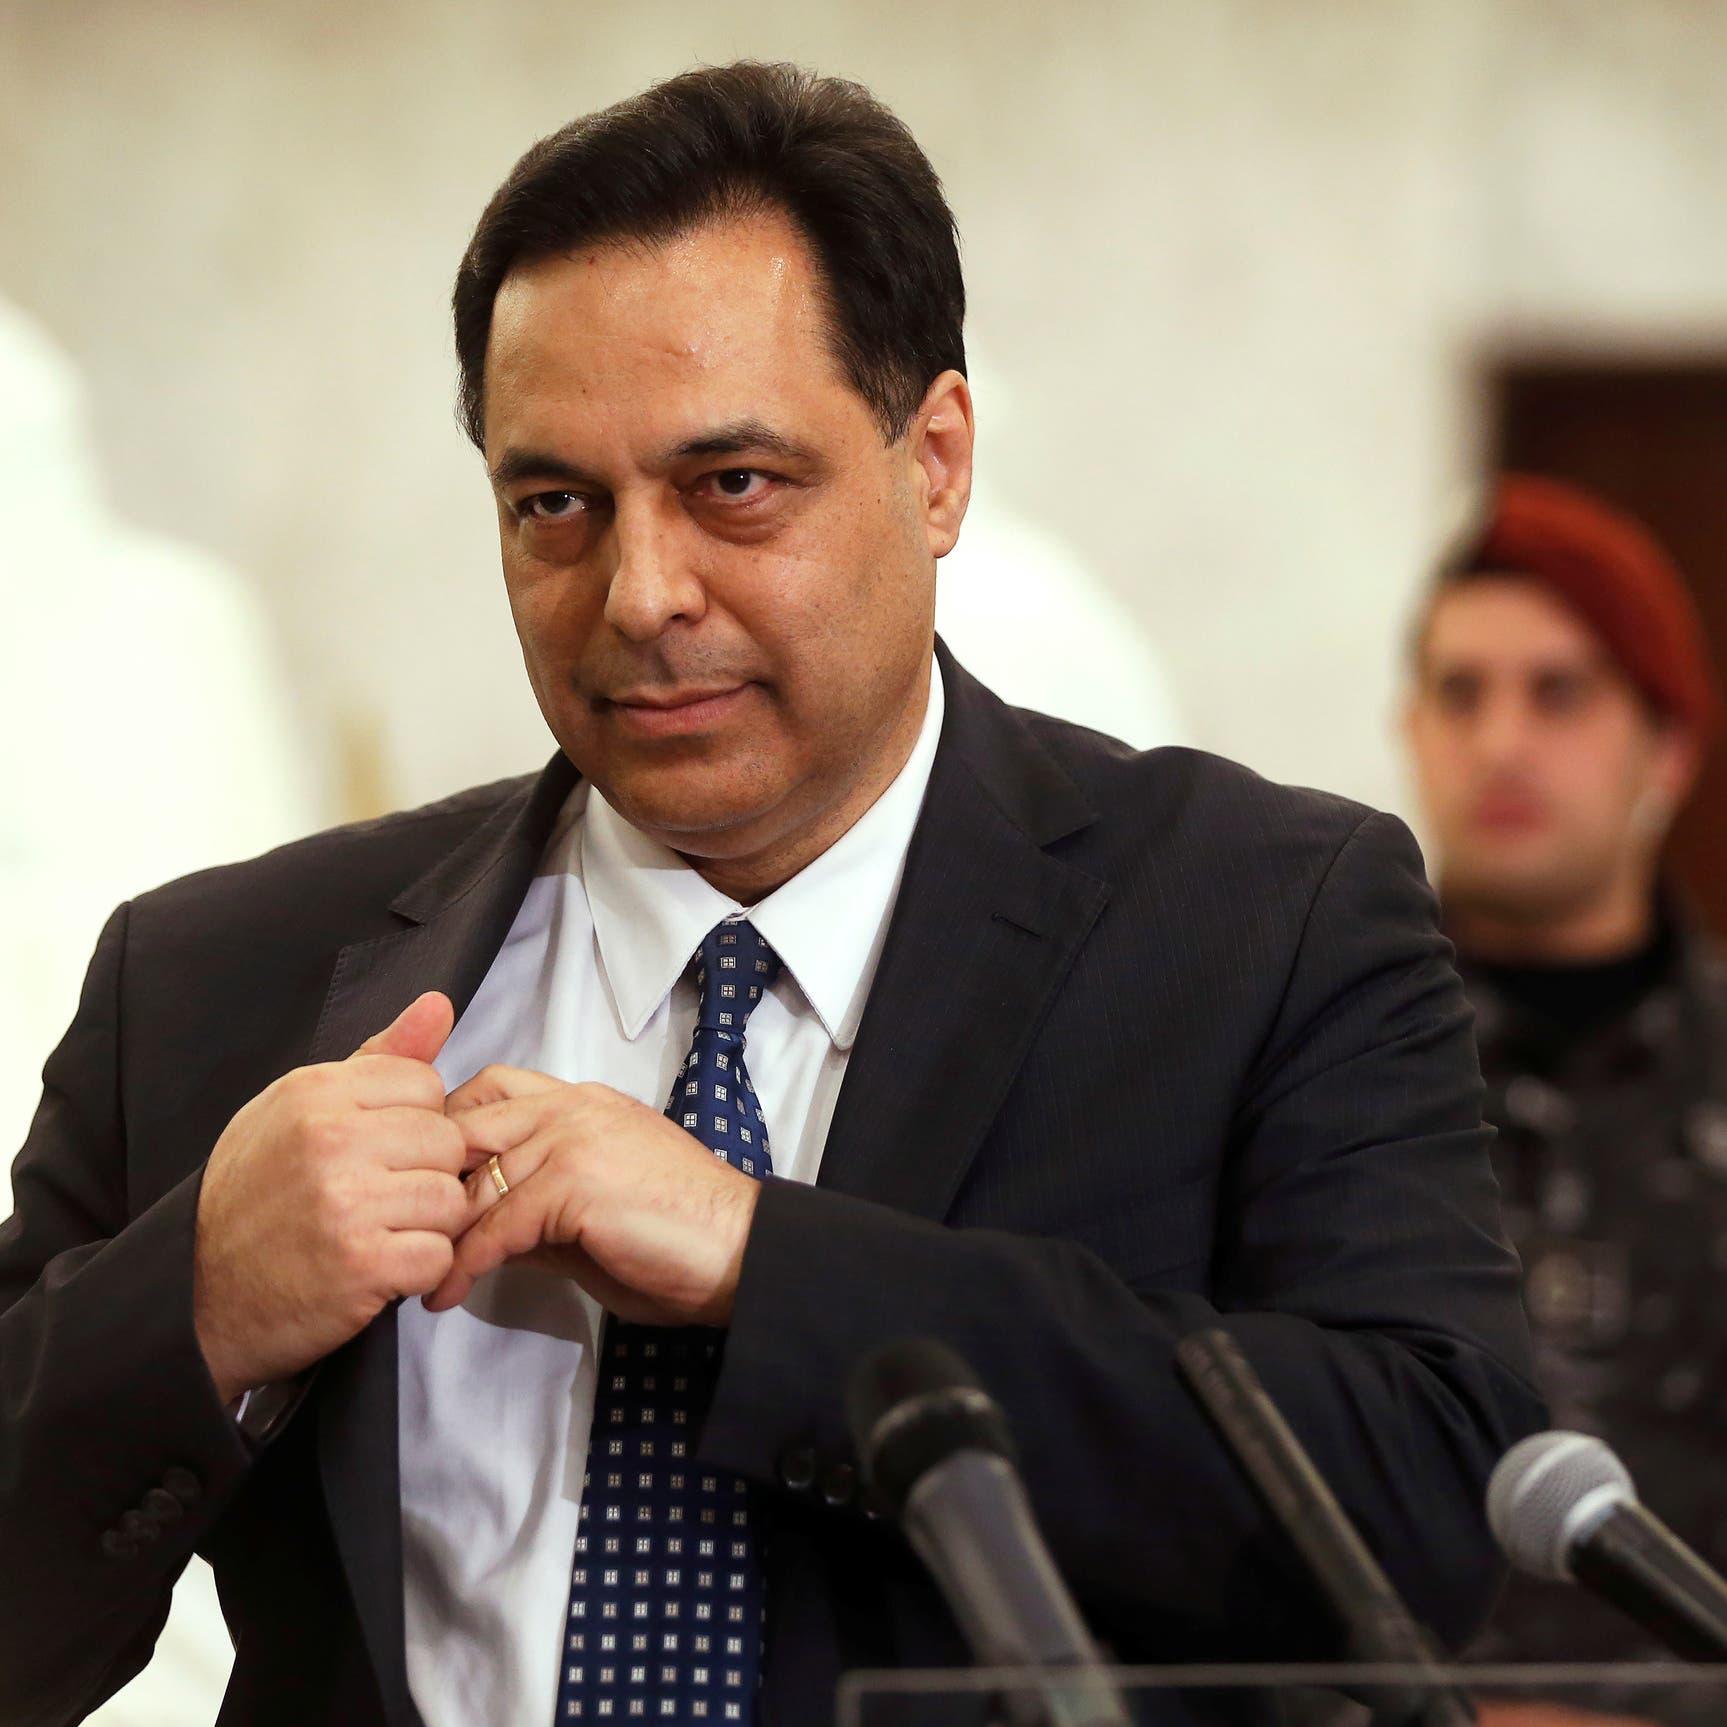 رئيس حكومة لبنان يعلن نزوح 5.7 مليار دولار بشهرين